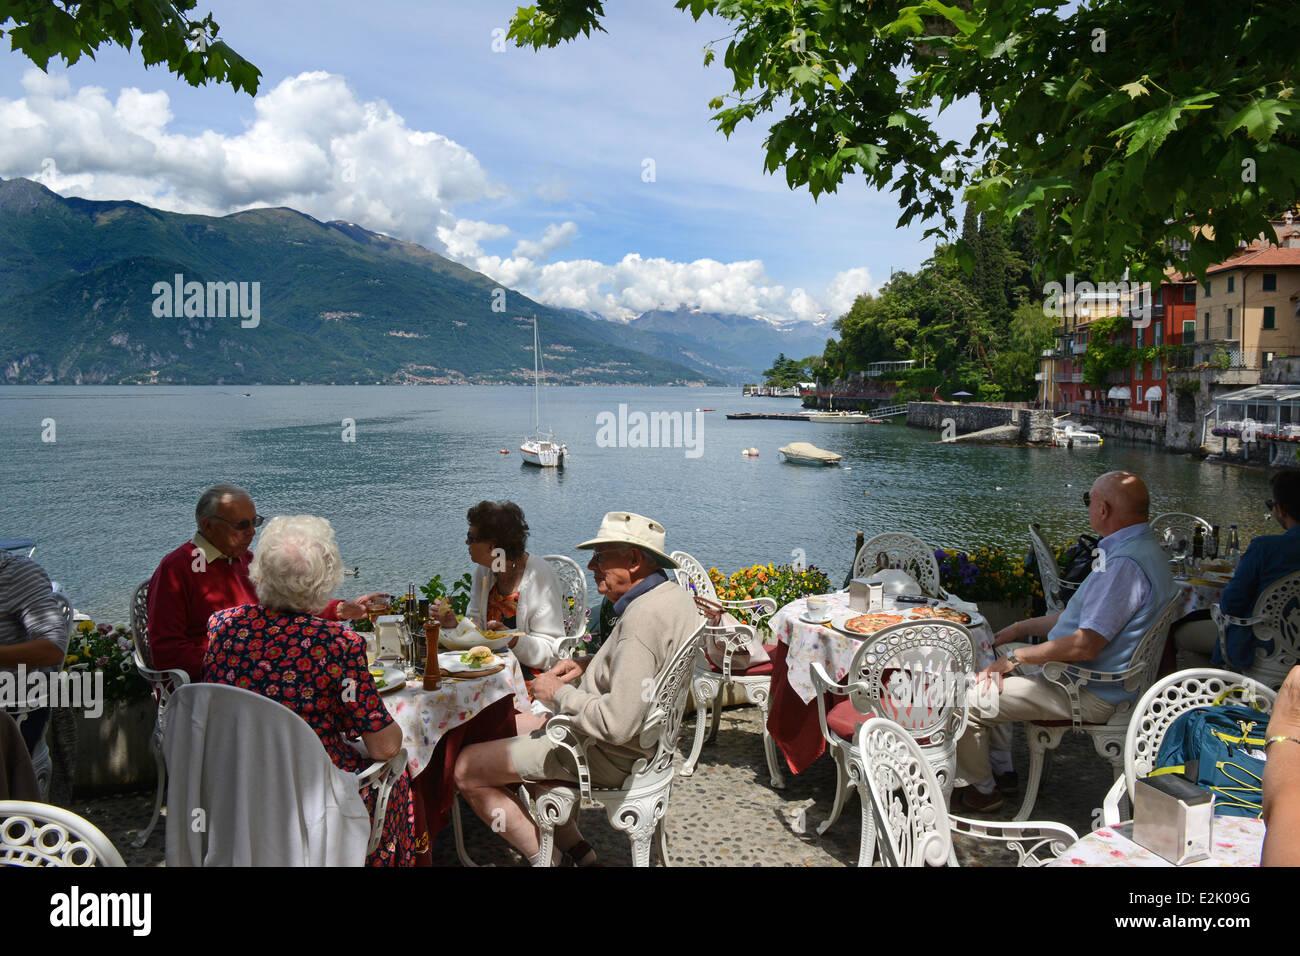 Lakeside dining at restaurant at Varenna on Lake Como Italy - Stock Image